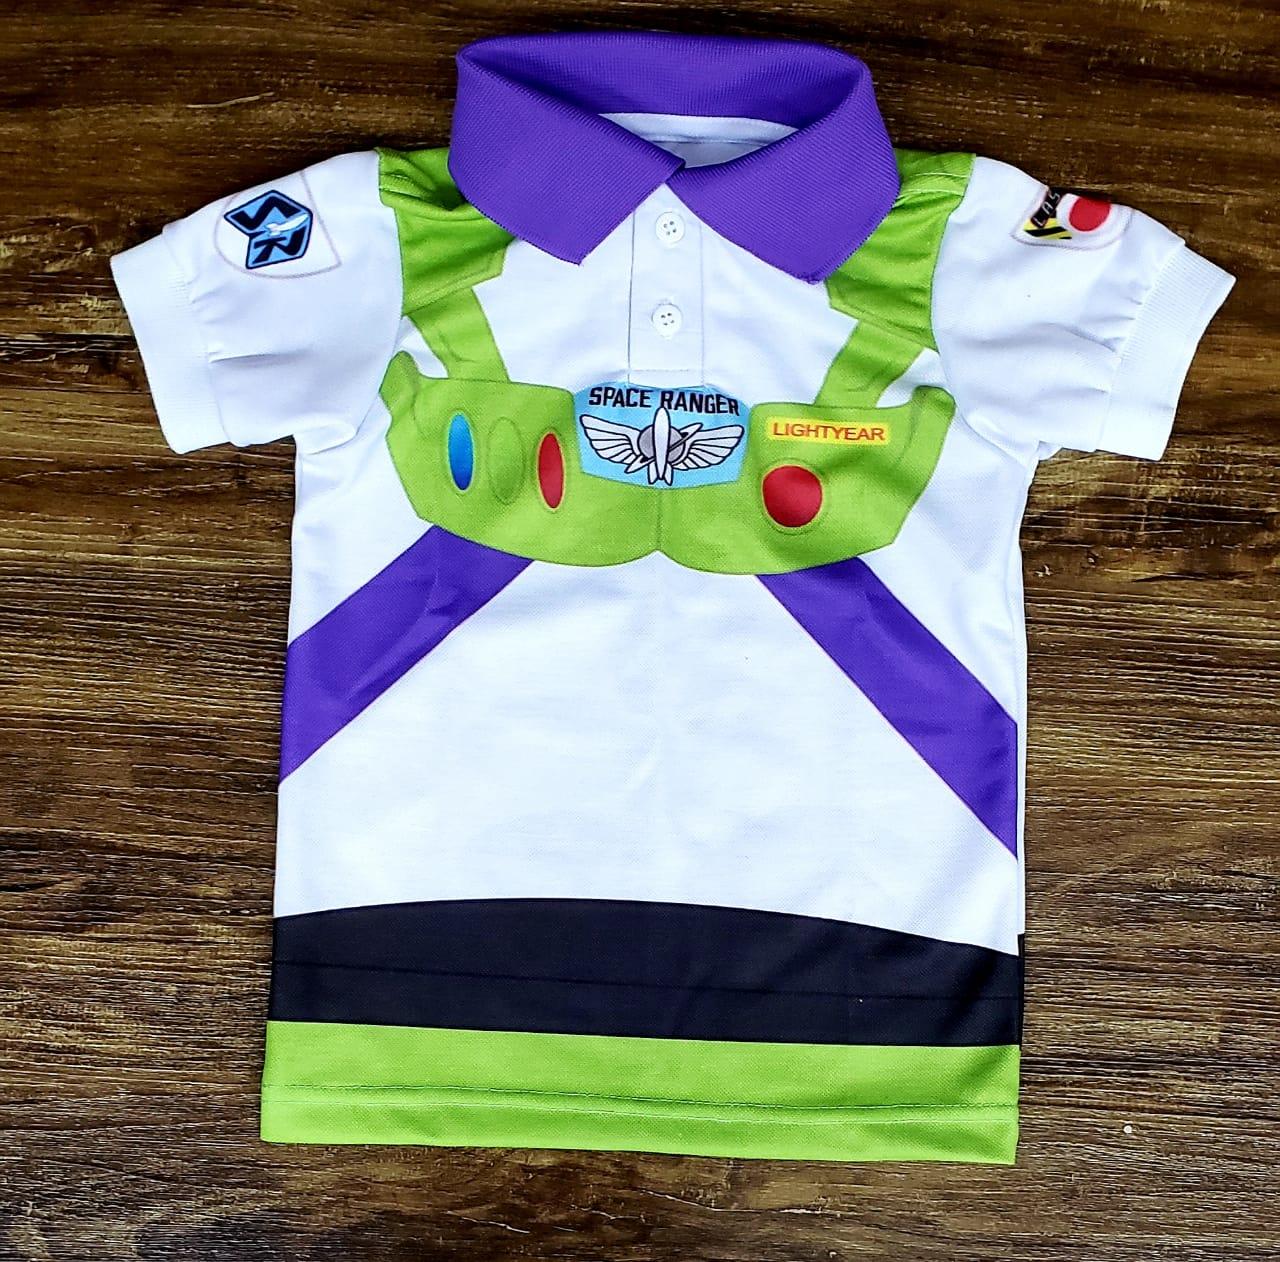 Polo Buzz Lightyear - Toy Story Infantil